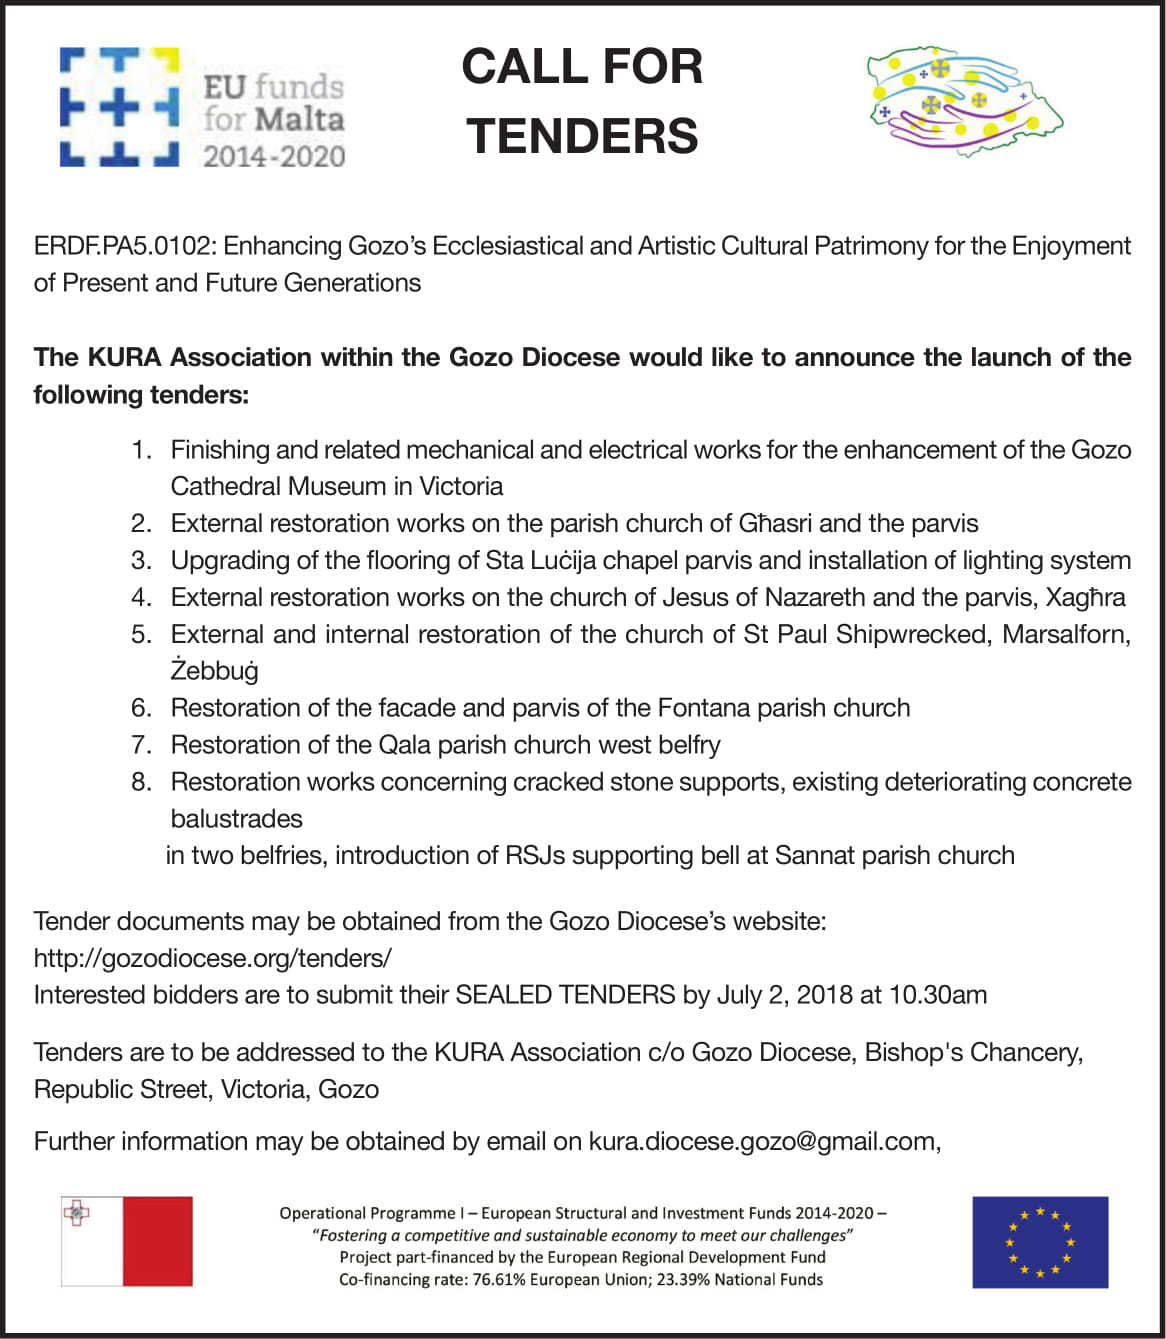 kura-association-tenders-advert.jpg